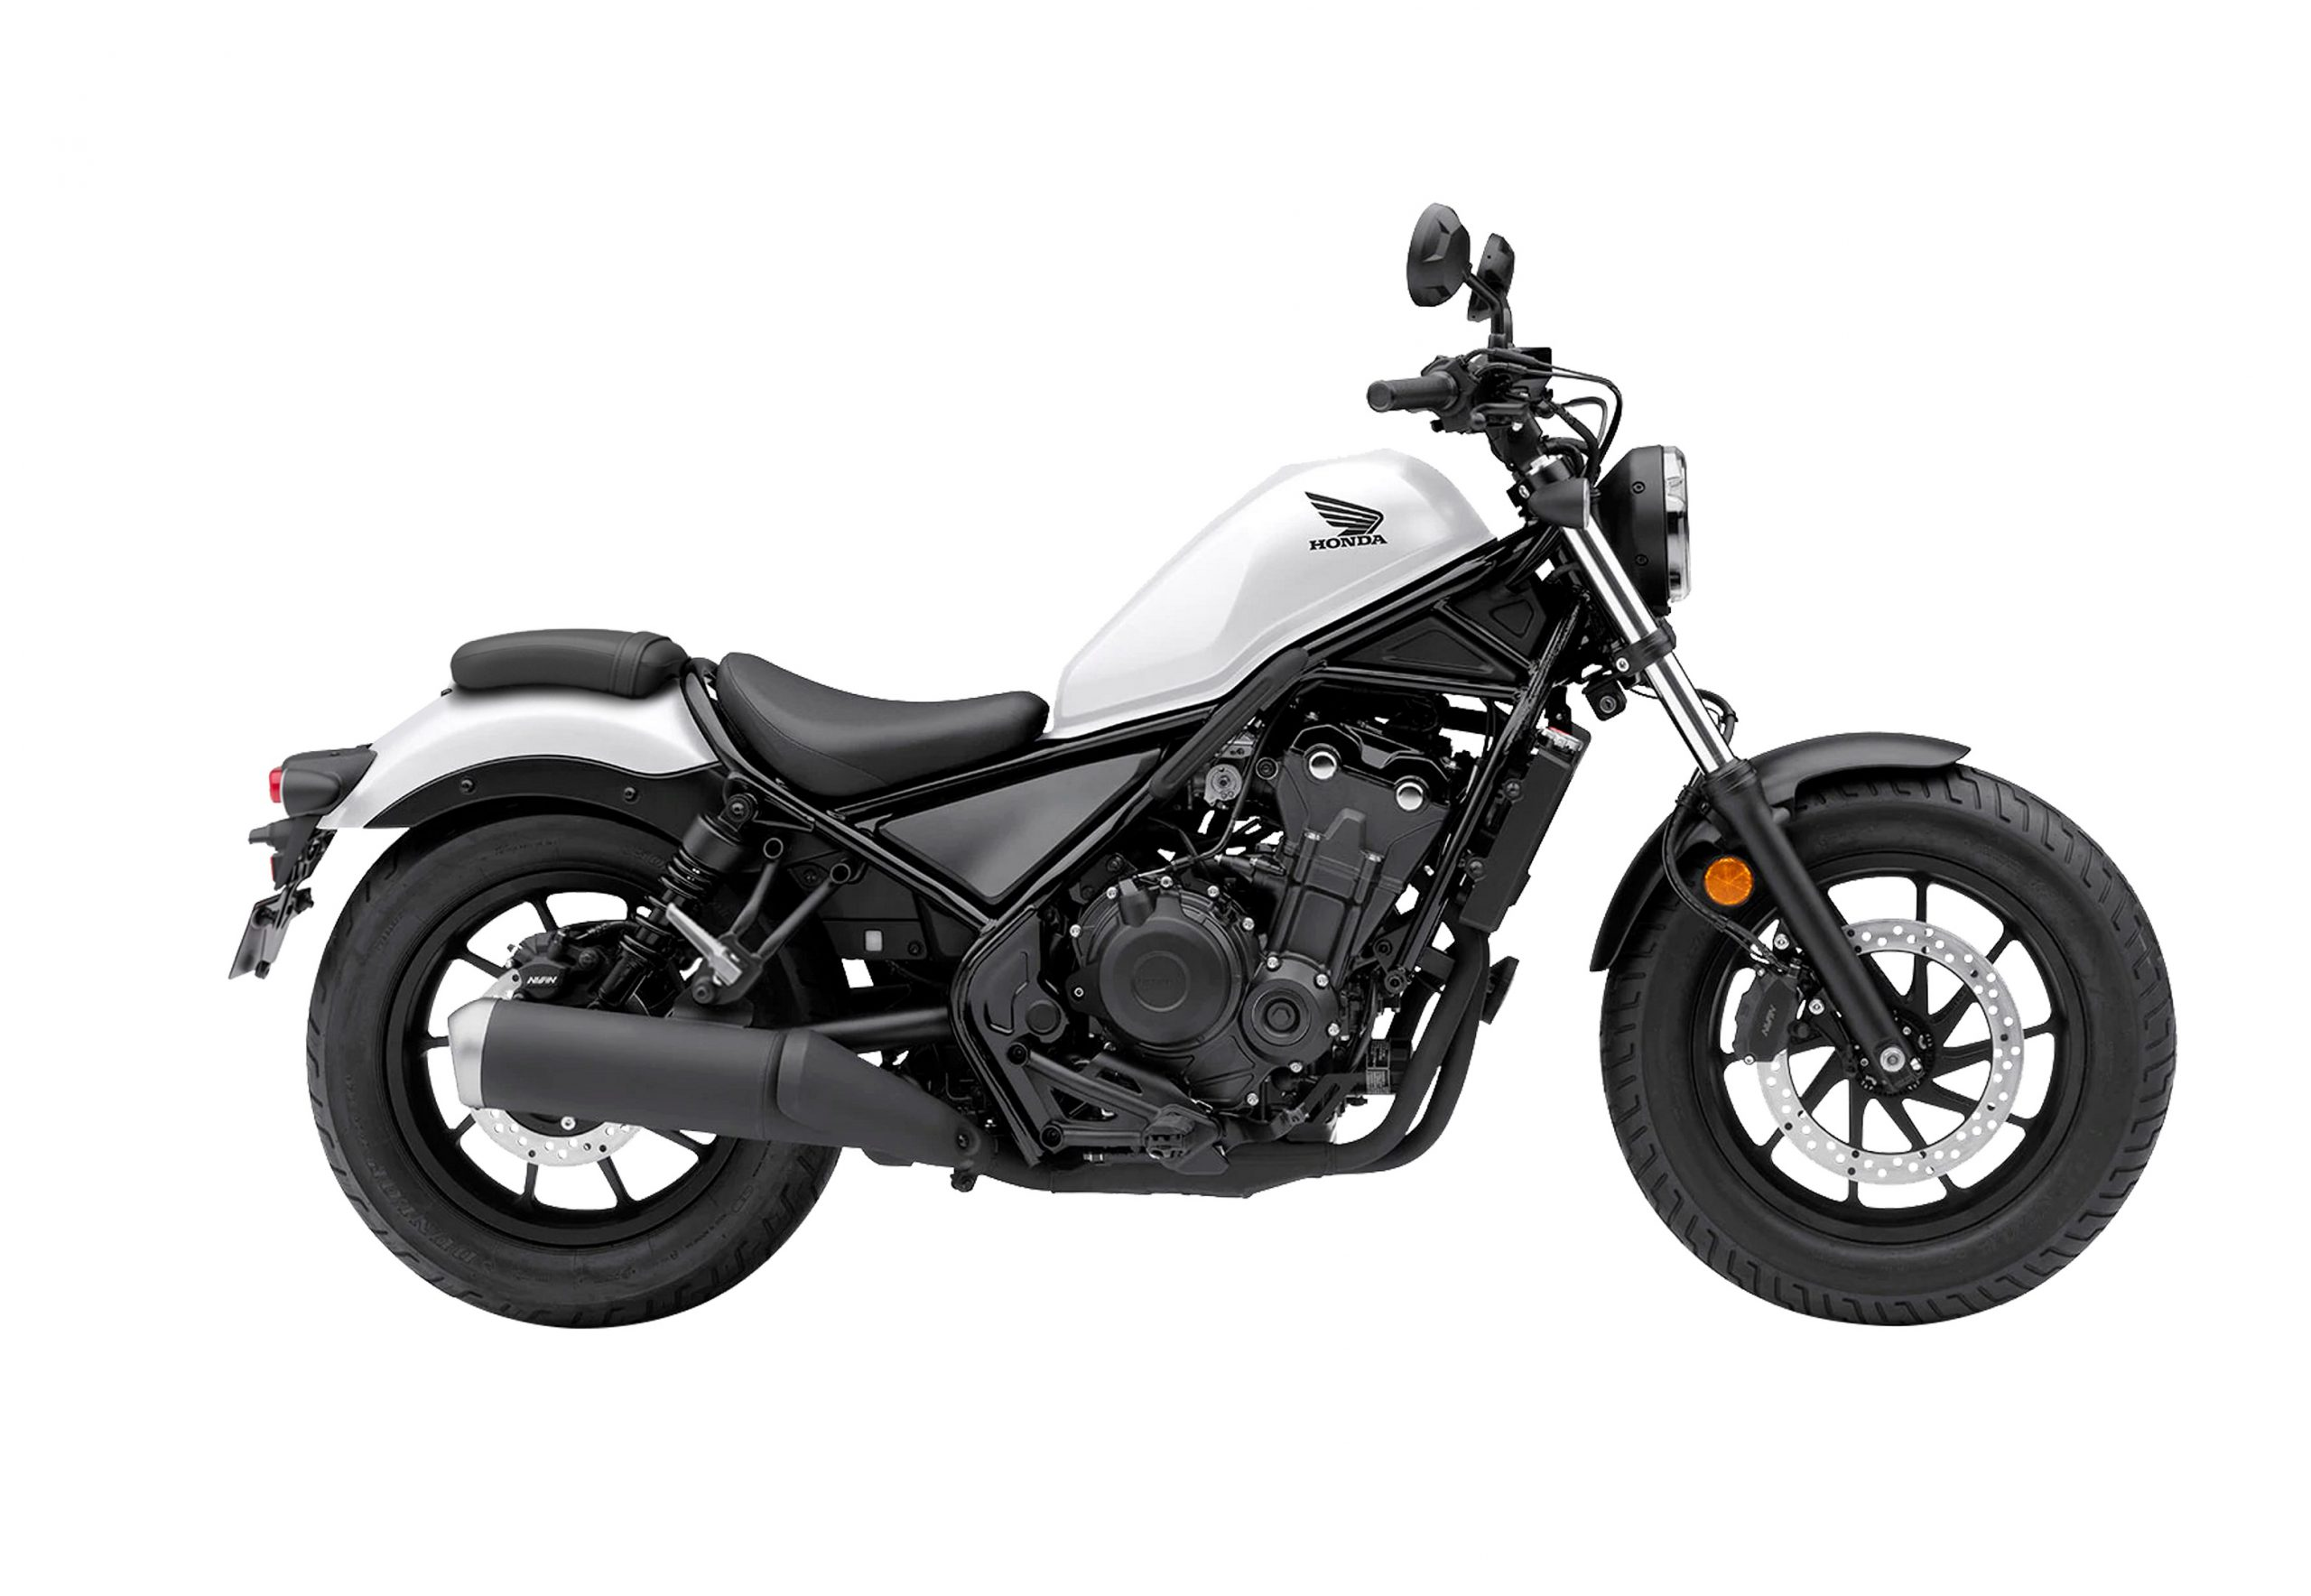 Honda Rebel Dapat Sentuhan Baru: Motor Bertampang Custom 500cc Ini Dibandrol Nyaris Rp 200 Juta